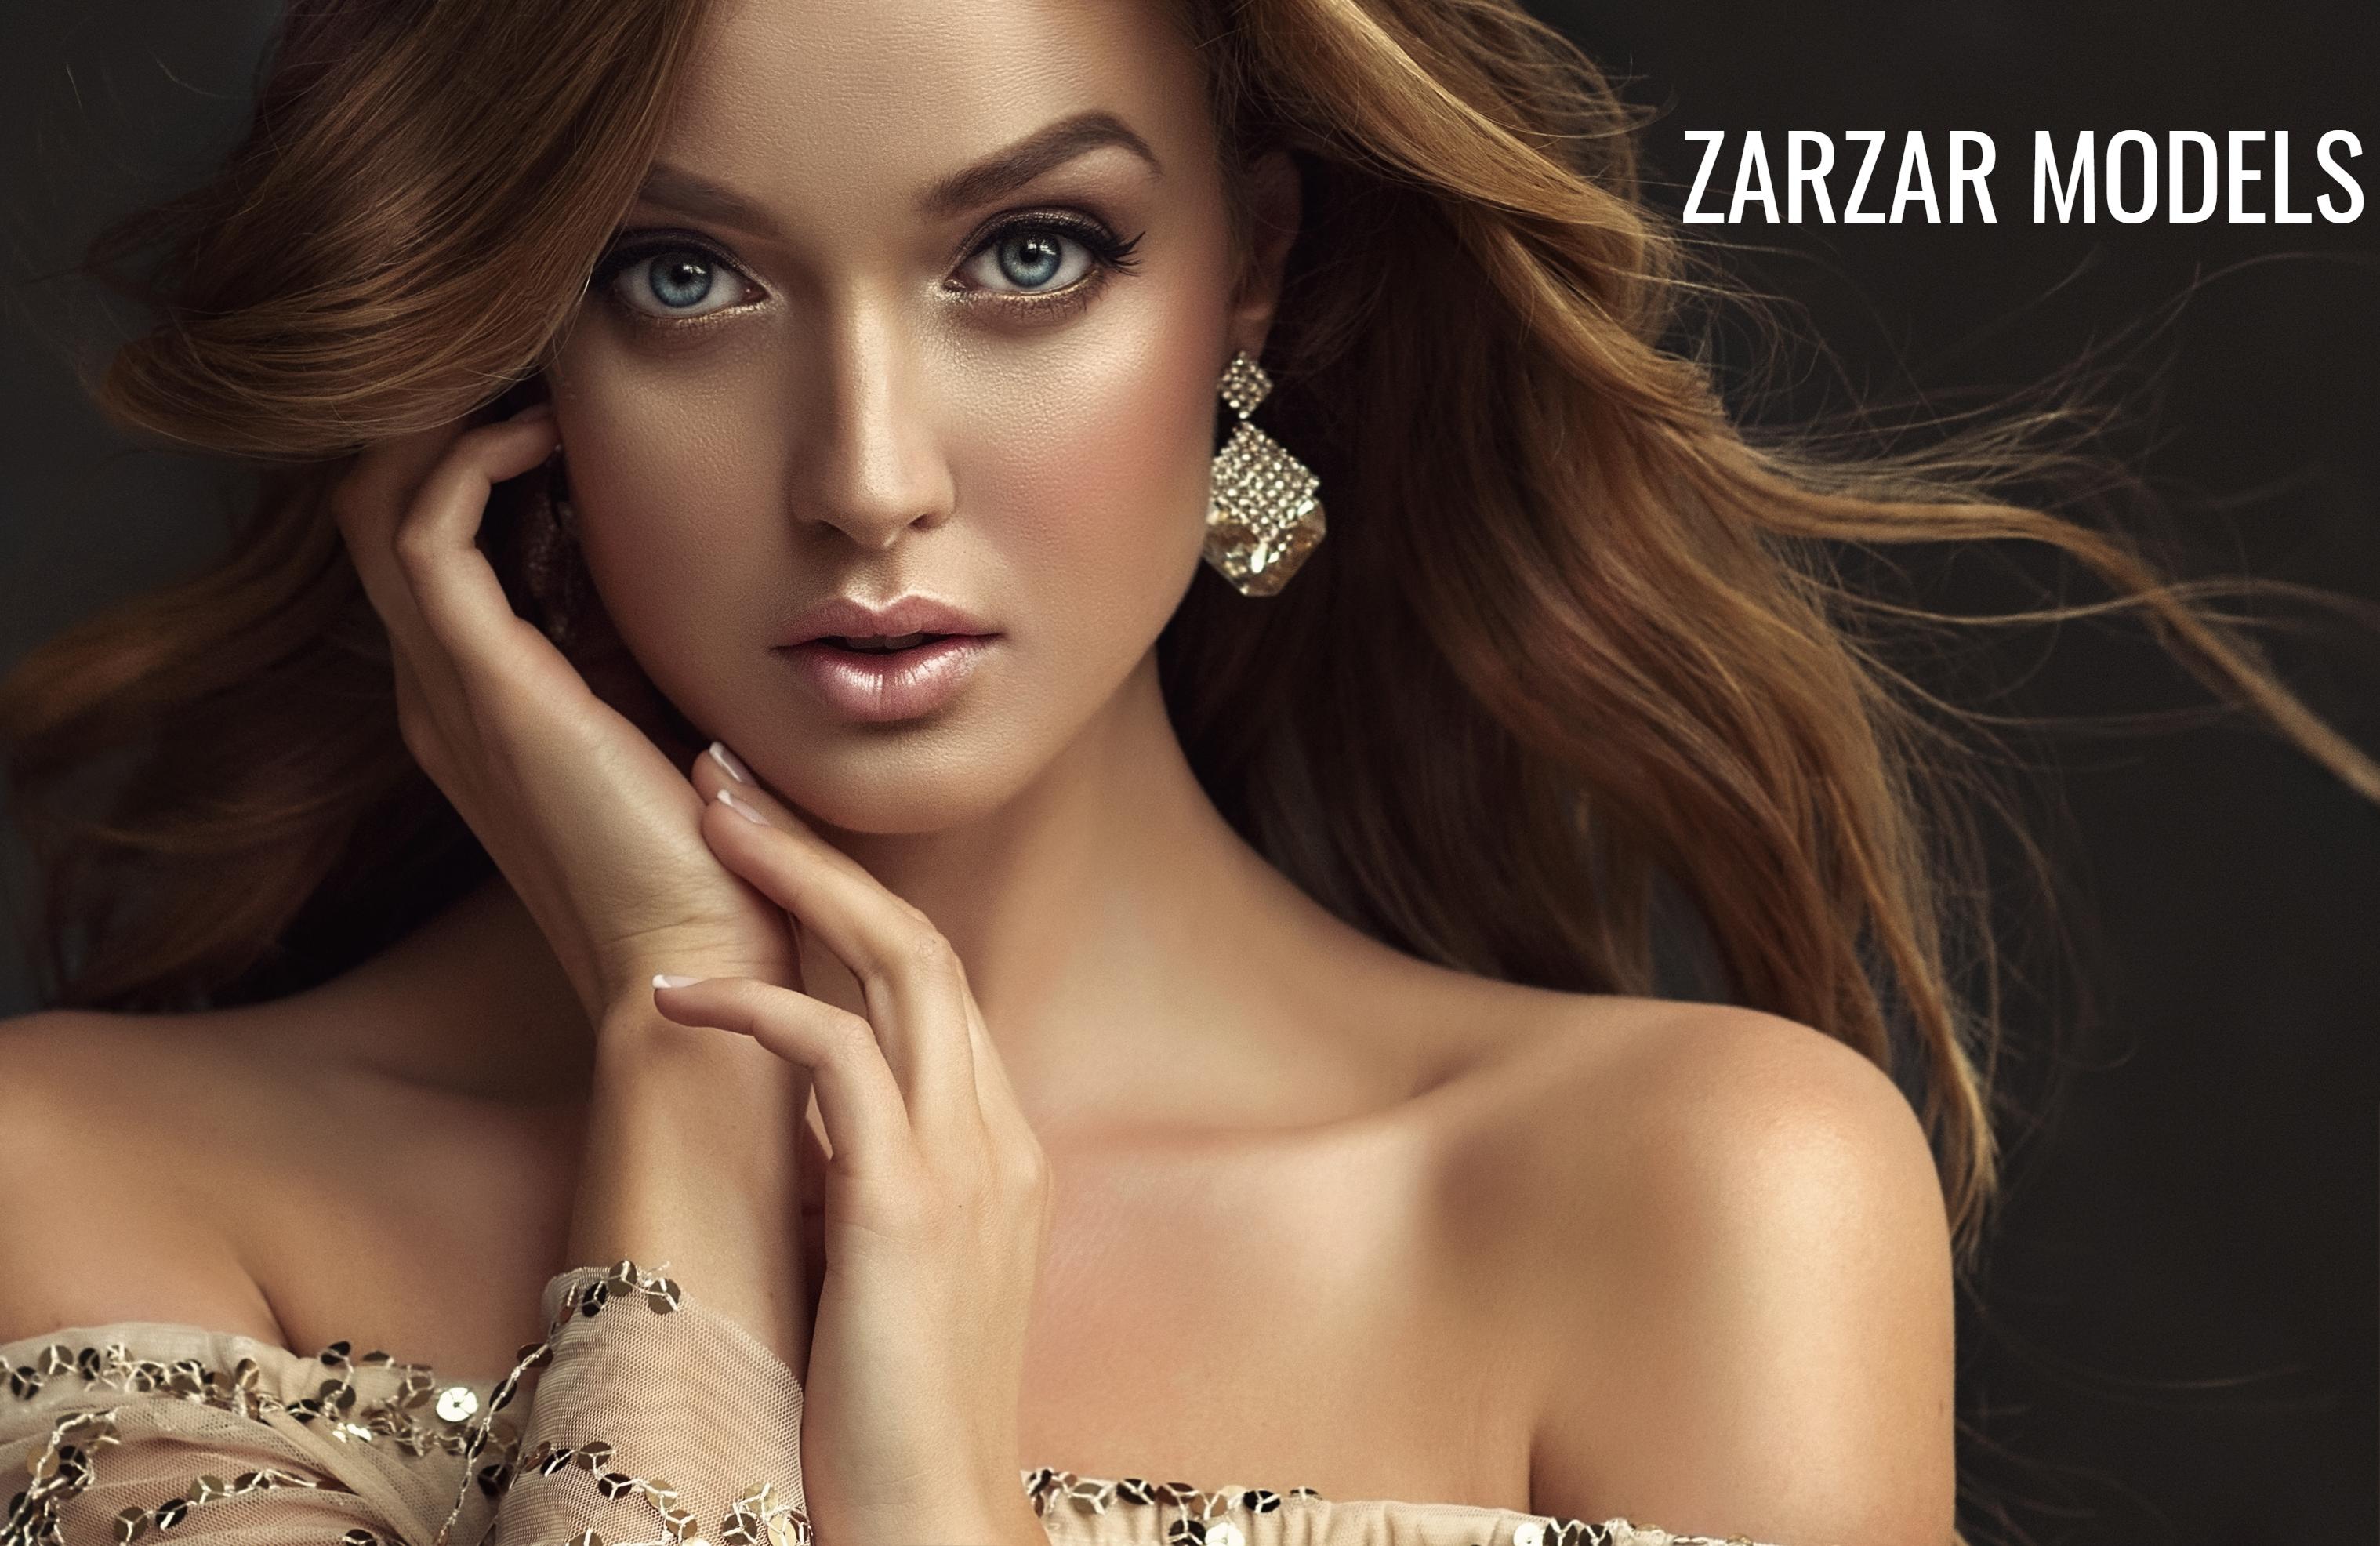 ZARZAR MODELS | Top Modeling Agency For Women, Teens, & Teenagers (Teenage Girls).